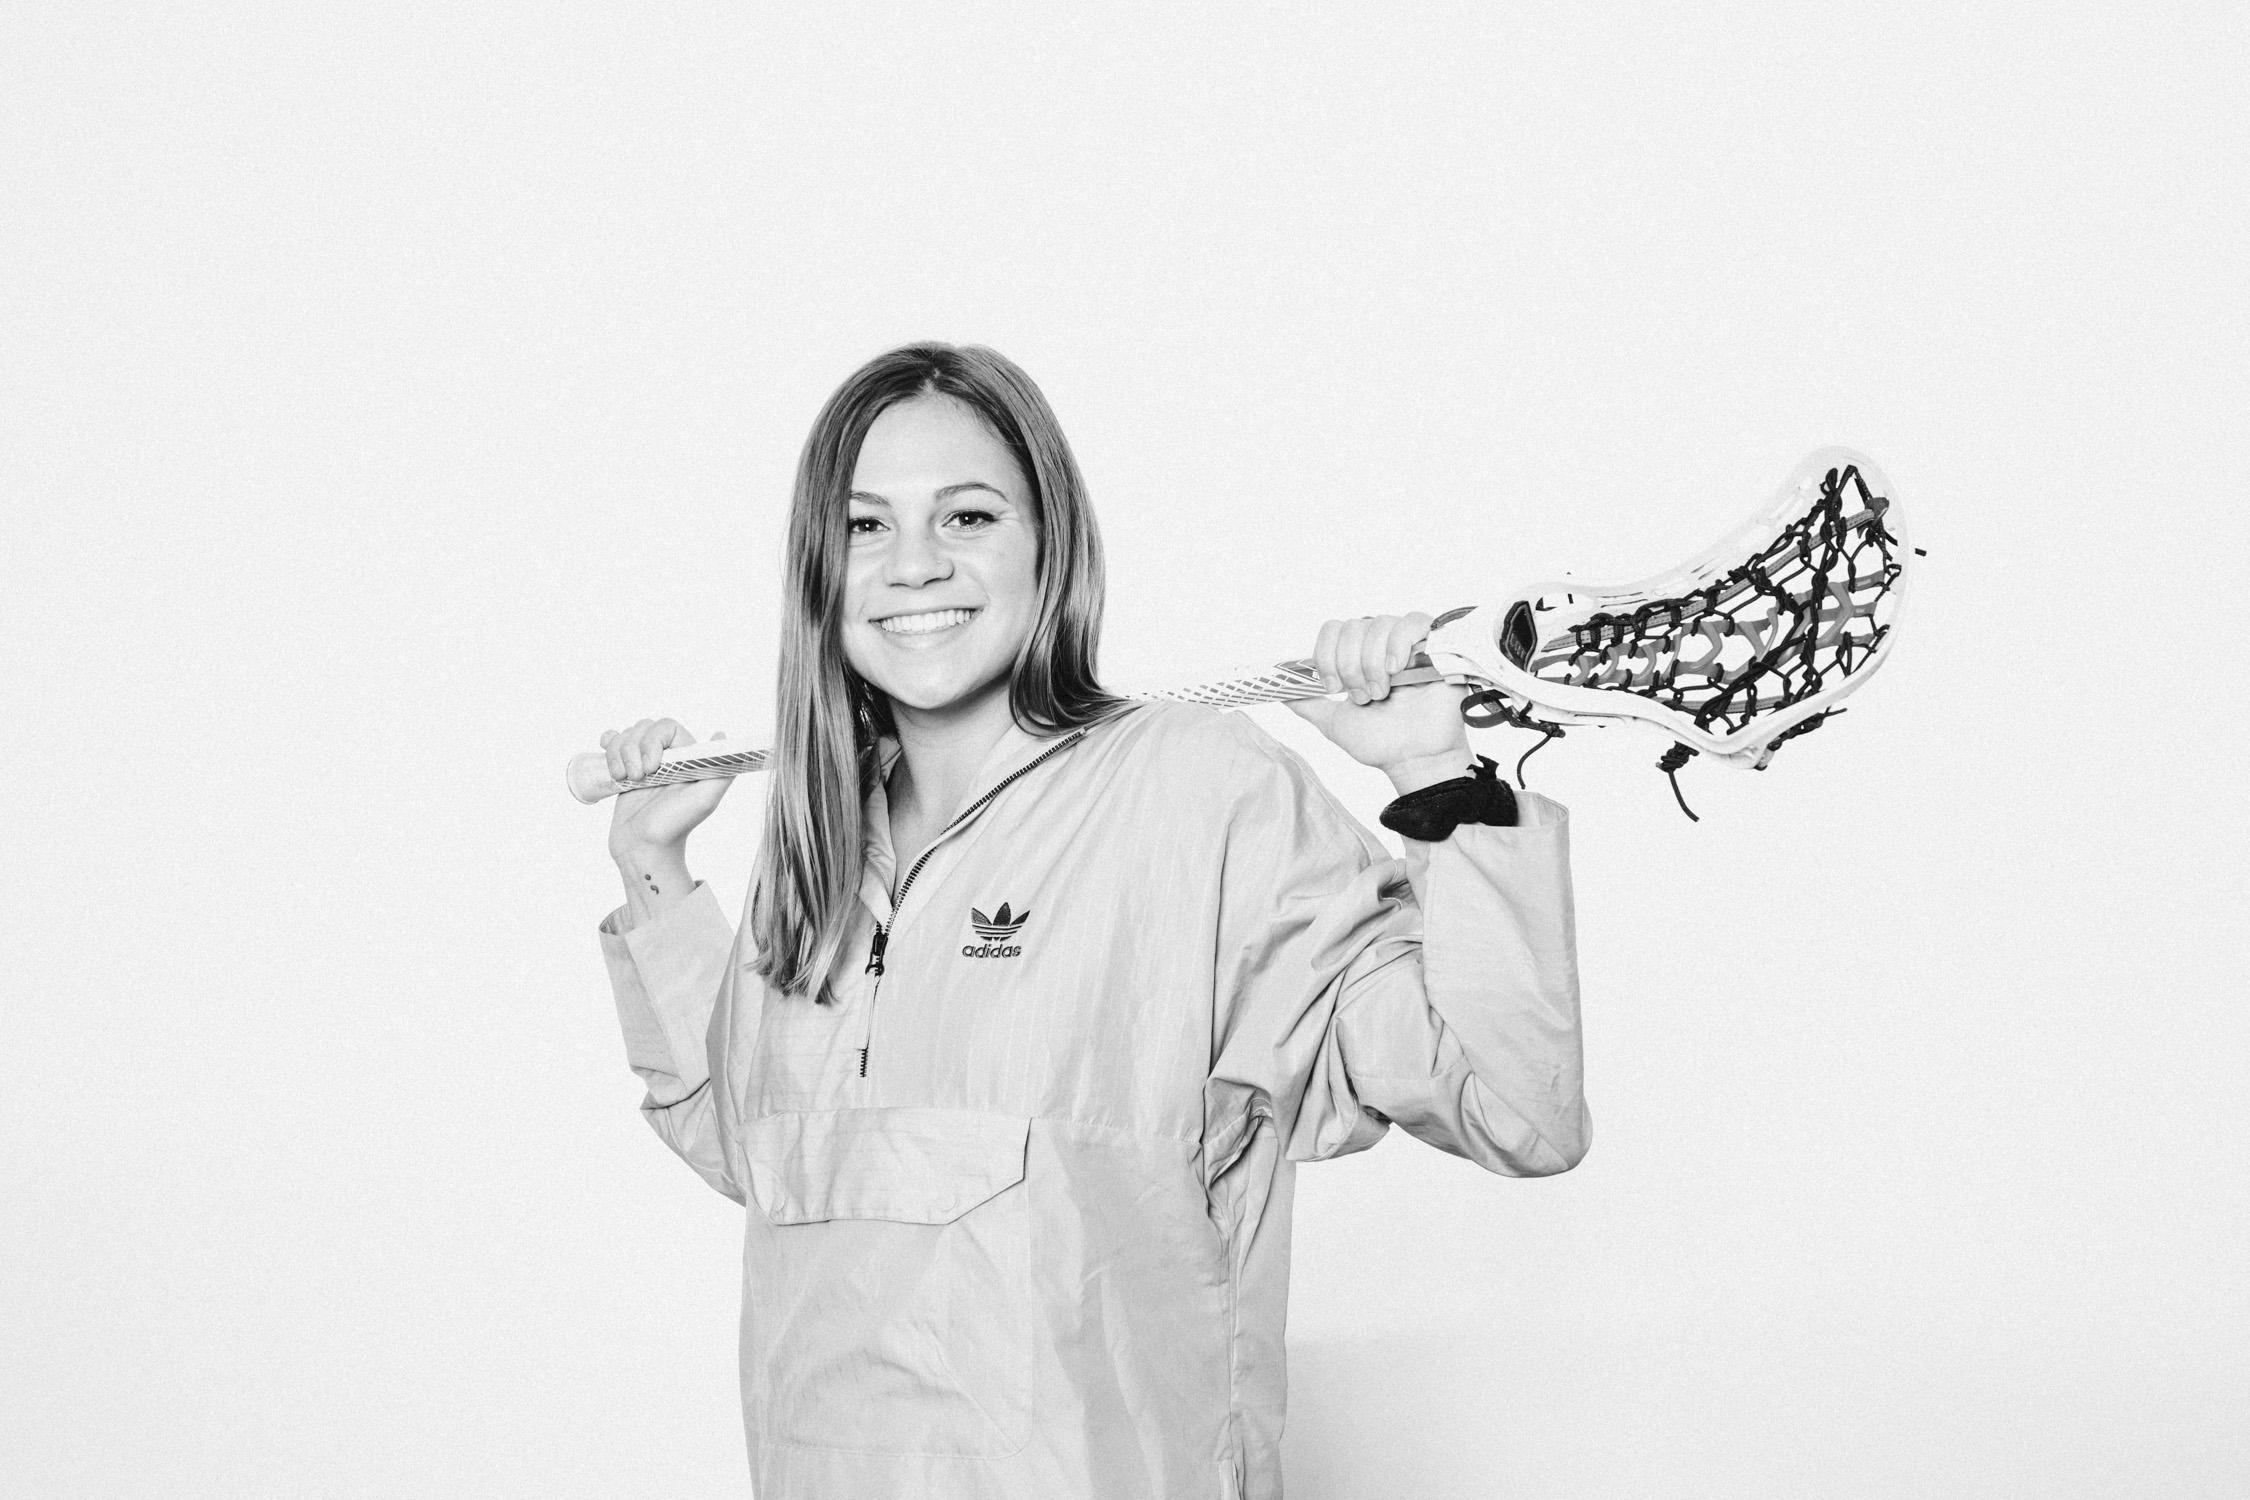 Adidas Portraits-6716.jpg